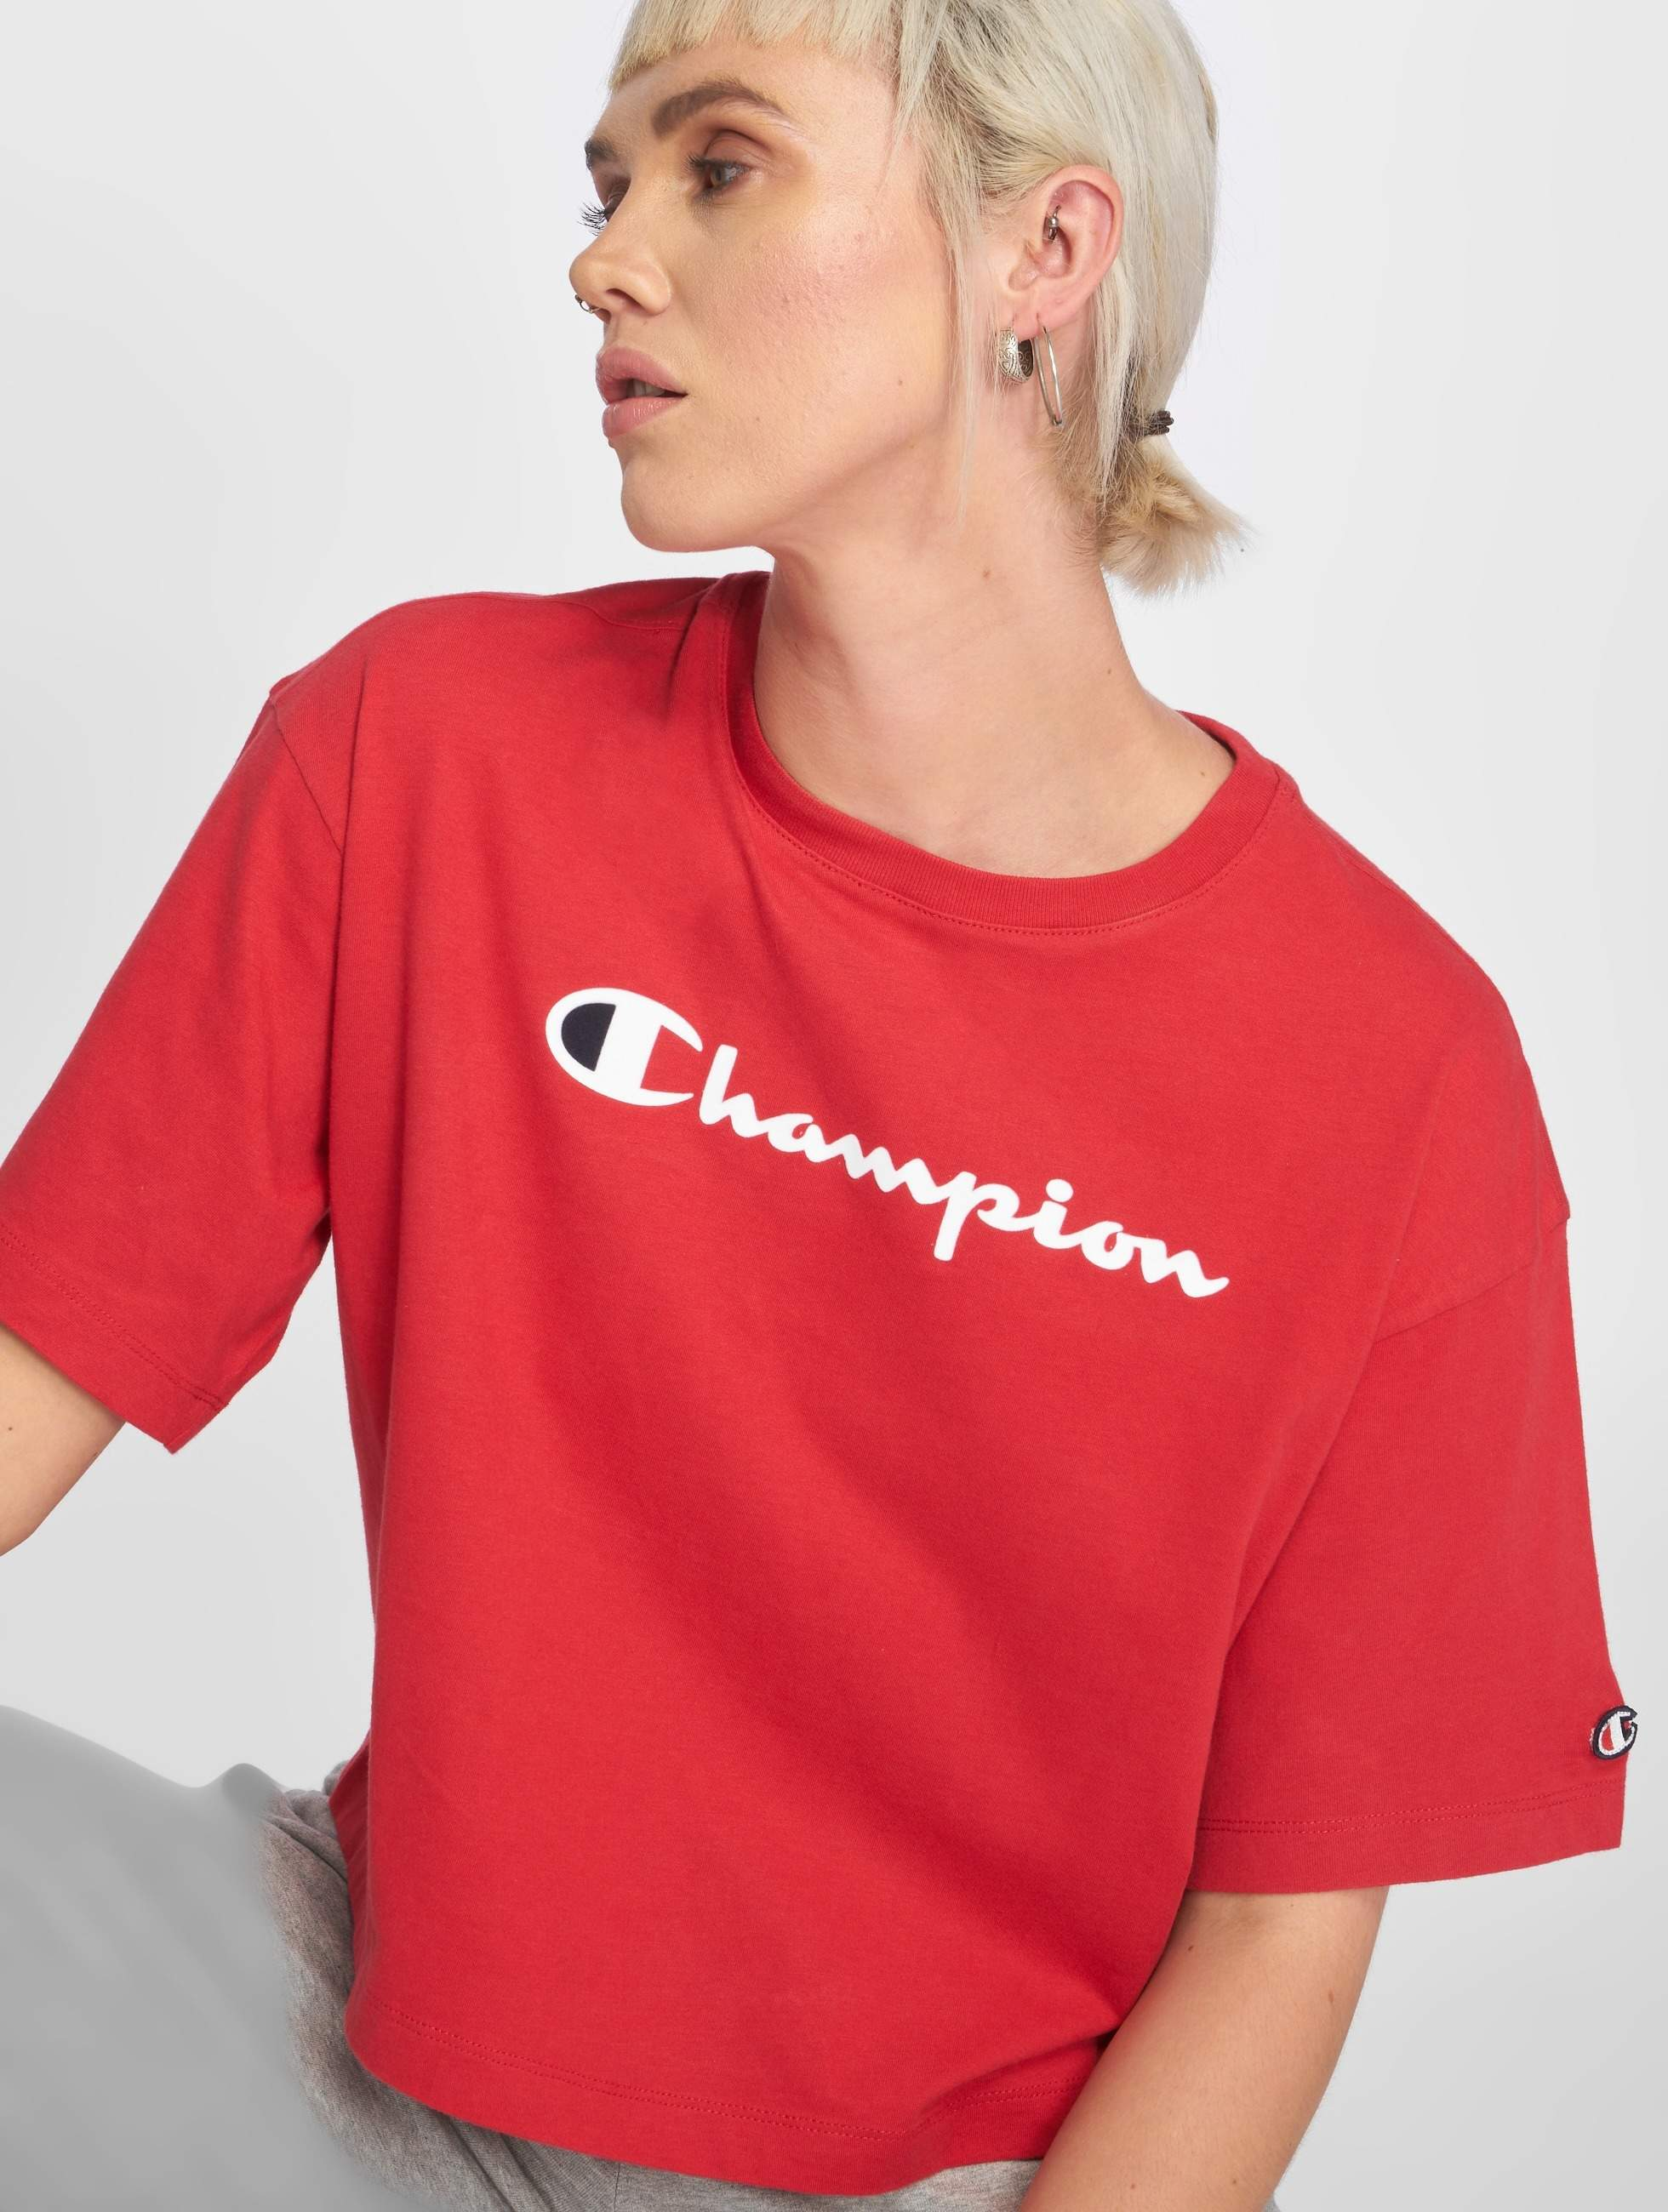 Bovenstuk Athletics Logo 529319 Shirt Rood T In Champion zPnWqSHcH